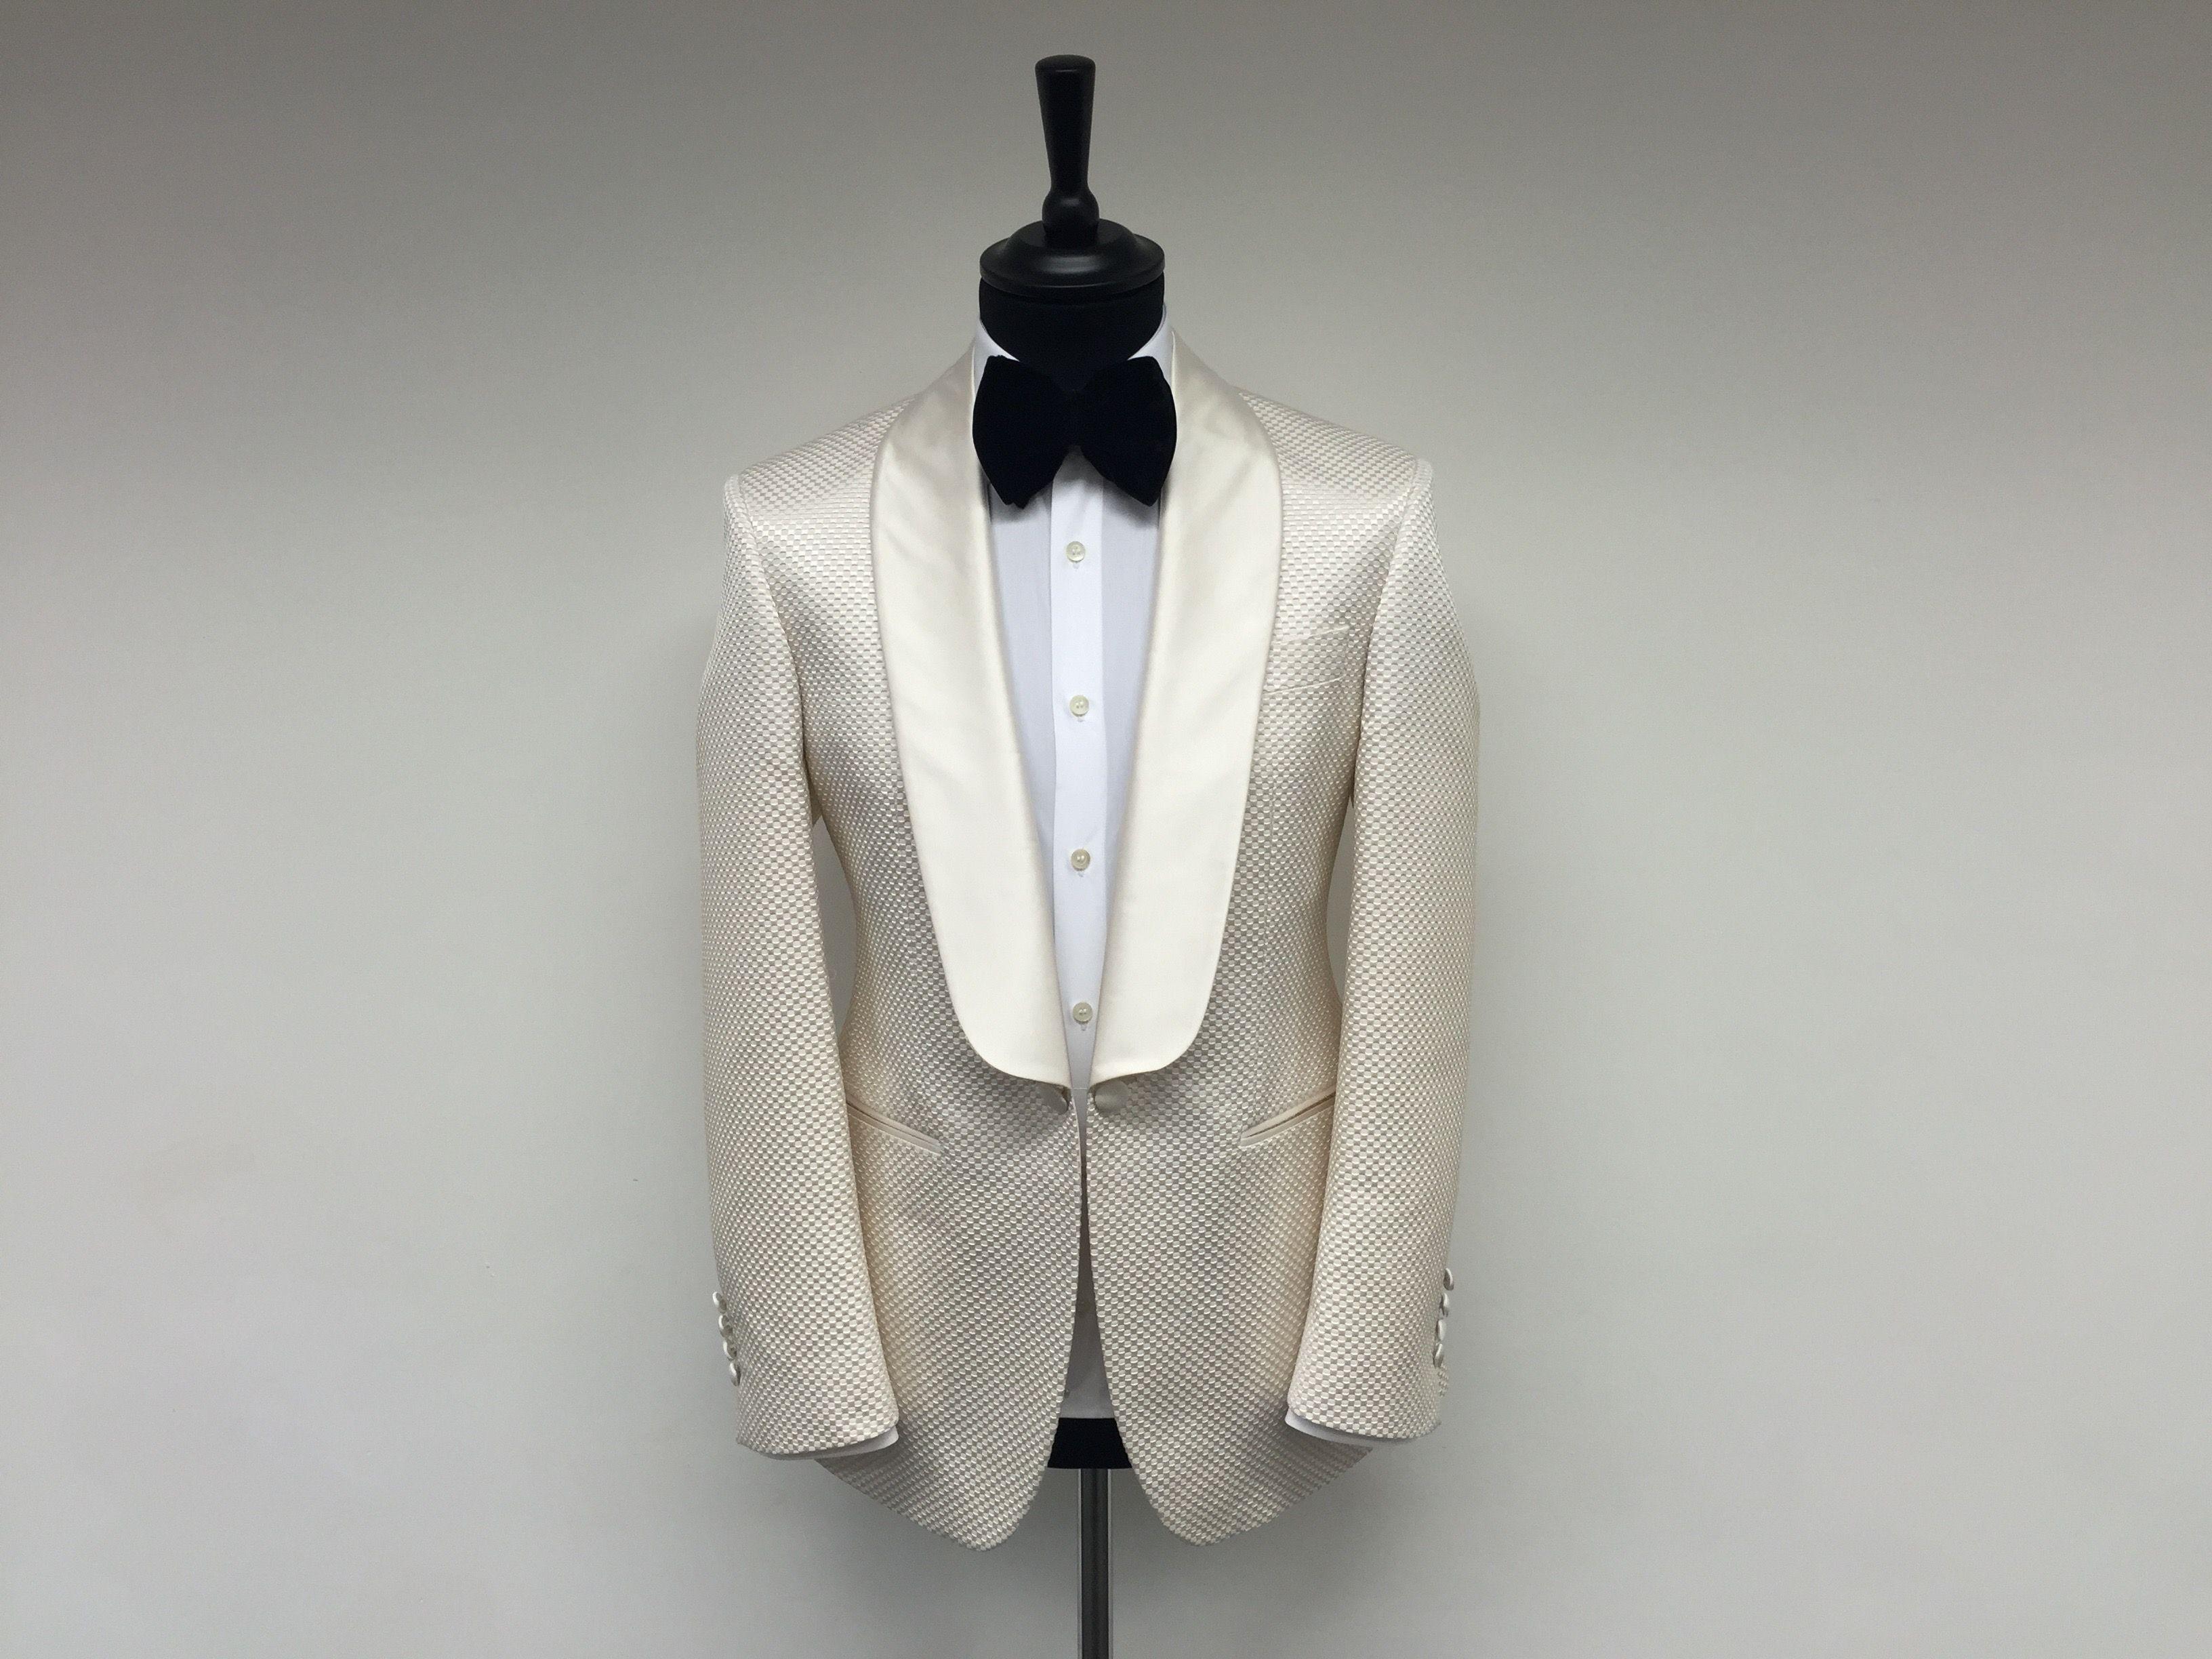 Marcel Ivory Tuxedo Blazer #KabiruAbu #bespoke #savilerow #tailored ...